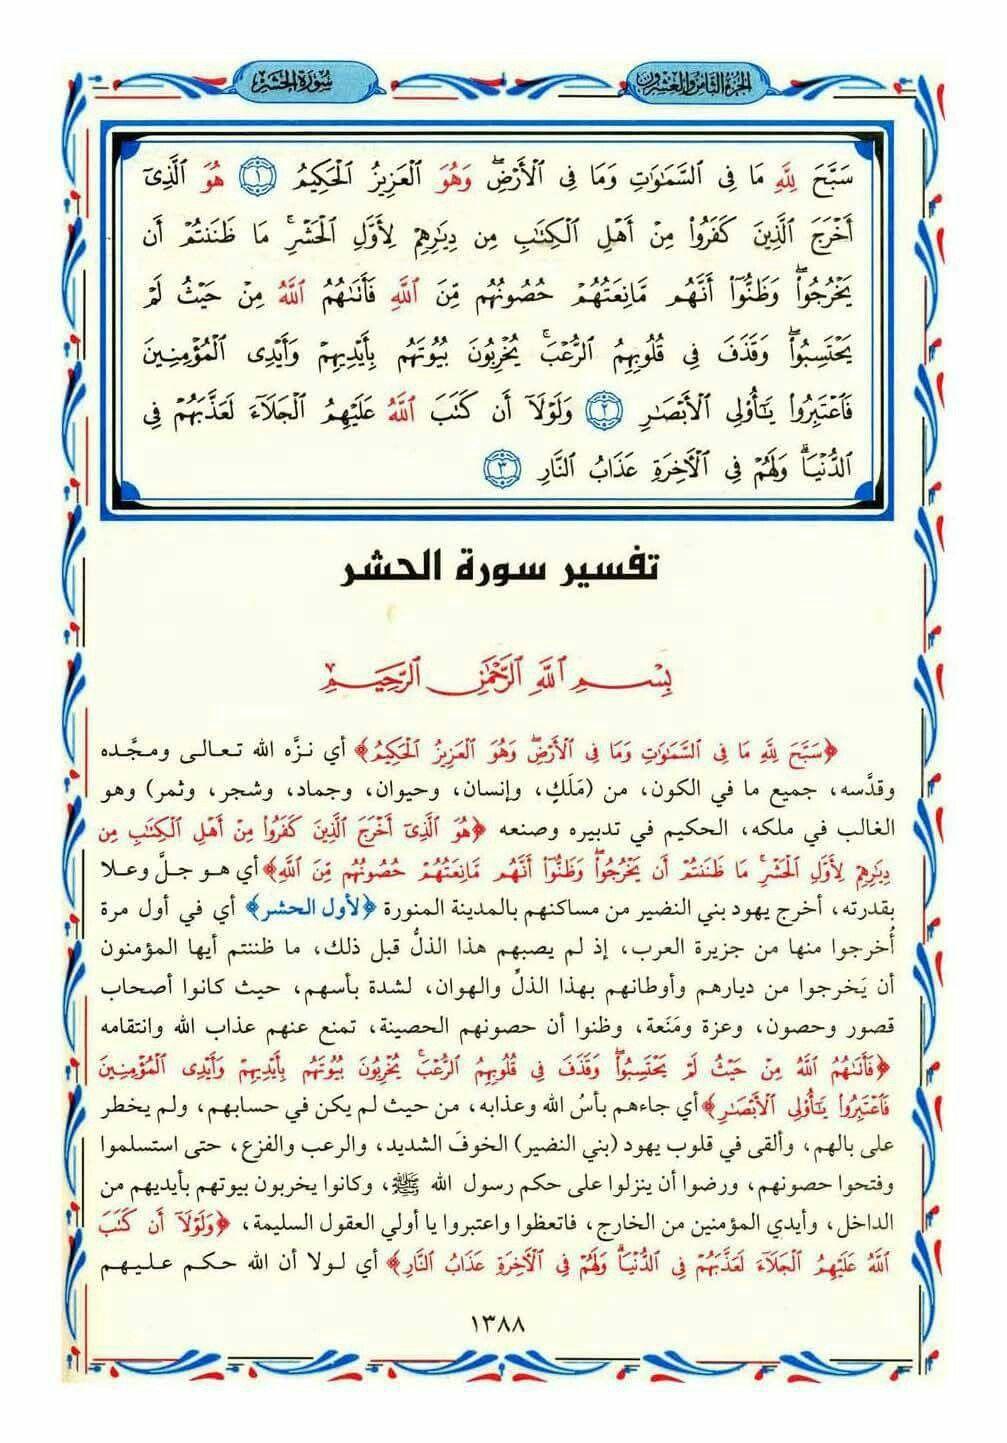 Pin By Mohamed Gamal On ٥٩ سورة الحشر Bullet Journal Journal Supplies